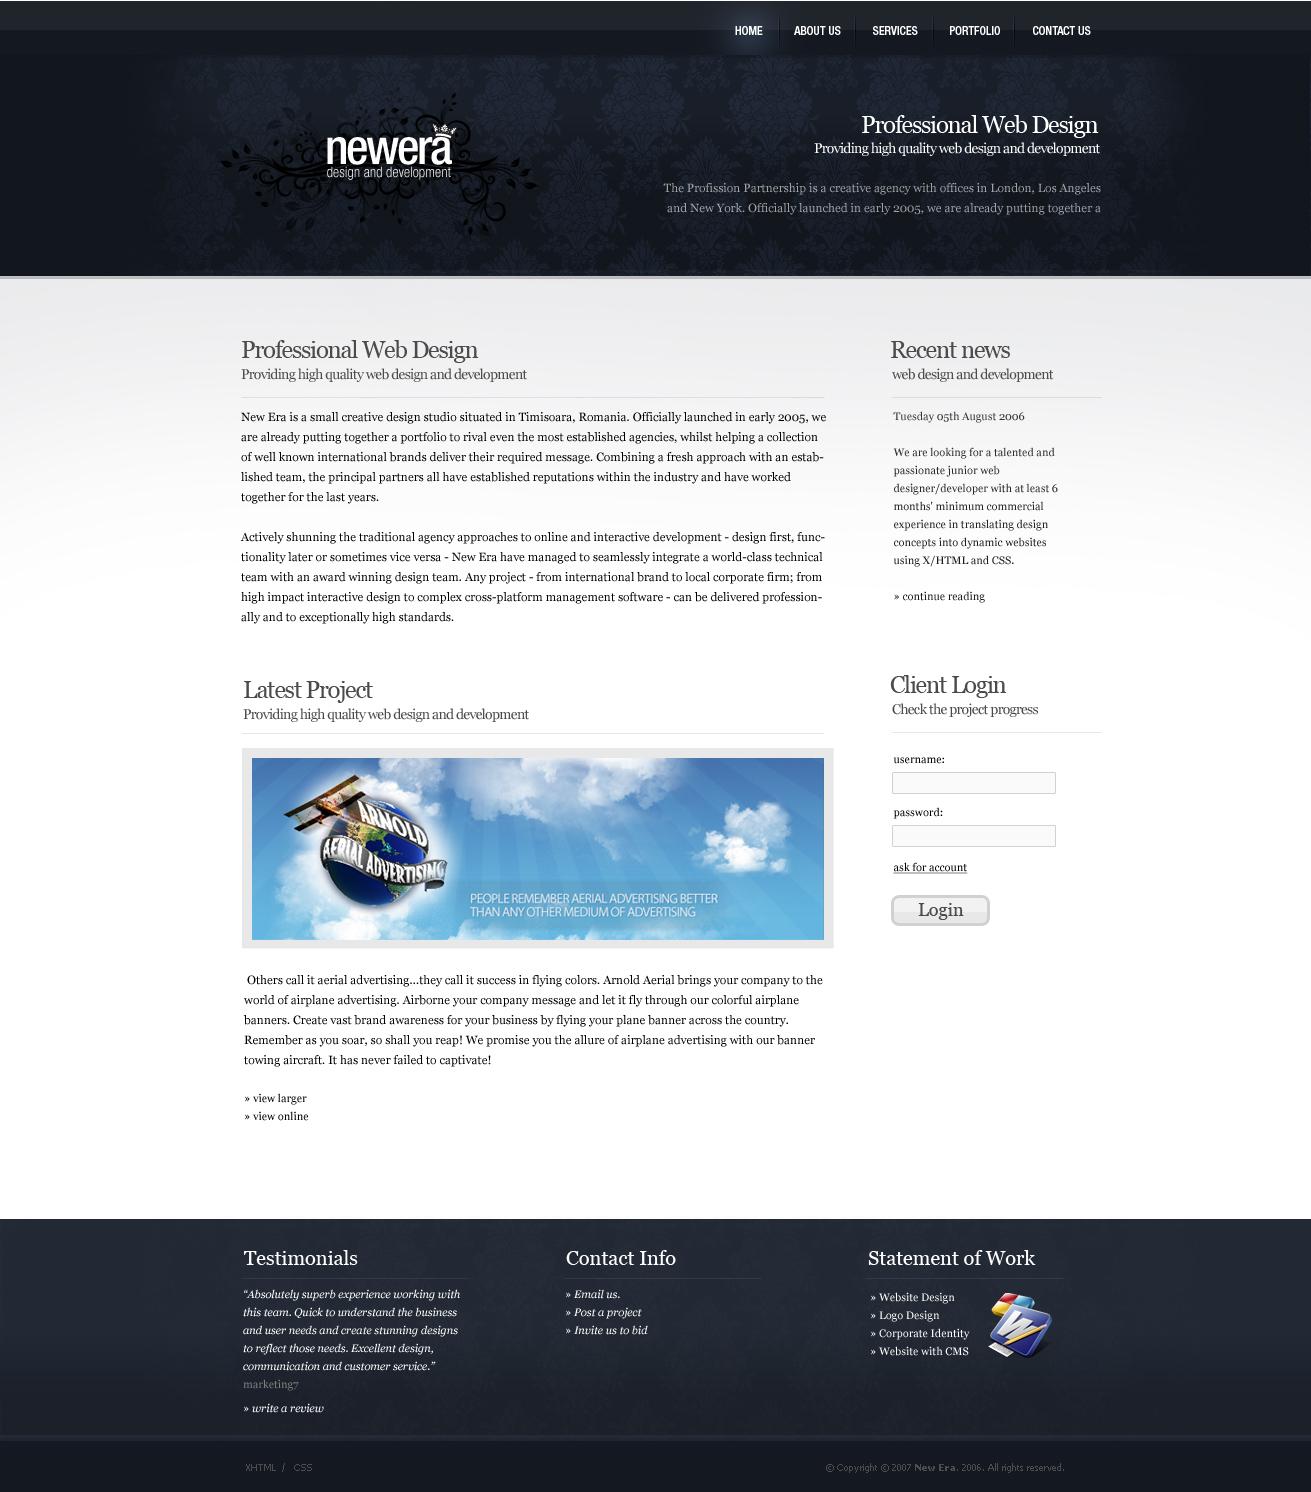 newera design studio site